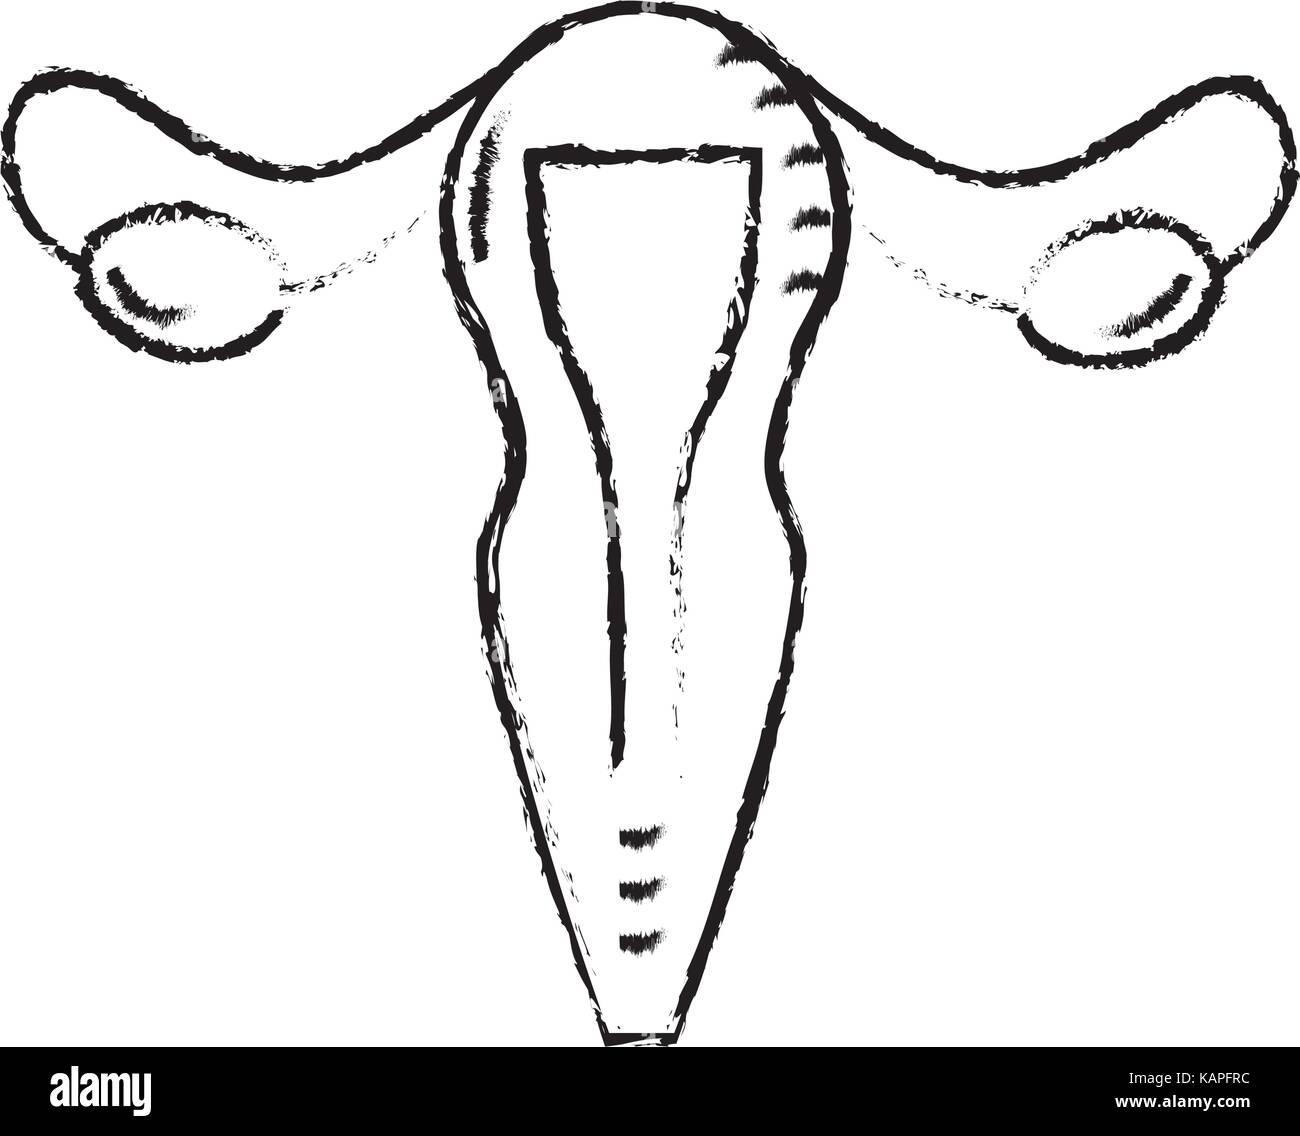 figure uterus fallopian tubes anatomy female Stock Vector Art ...